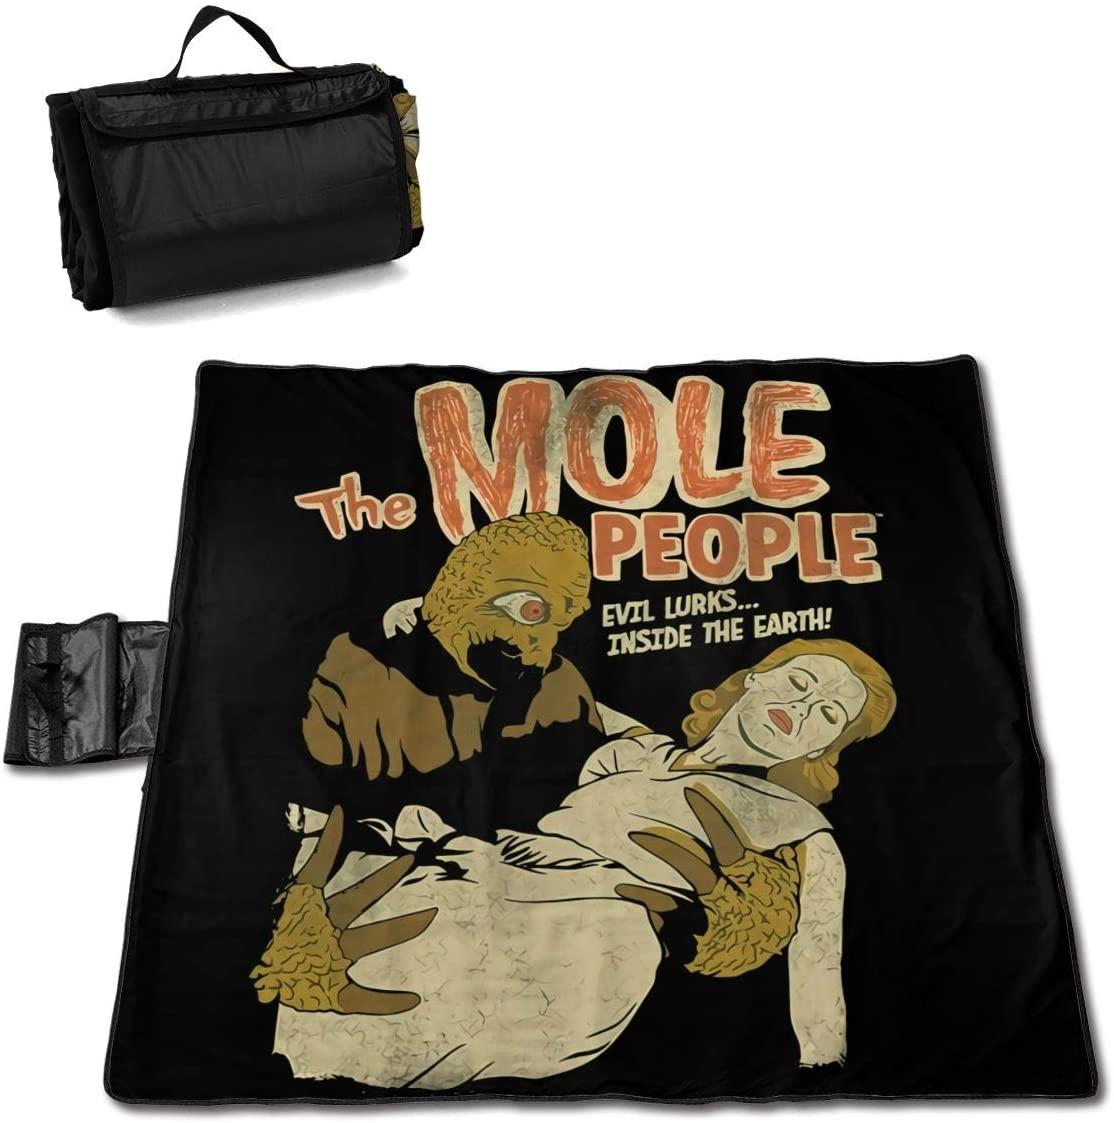 Htw The Mole People Portable Printed Picnic Blanket Waterproof 59x57(in)